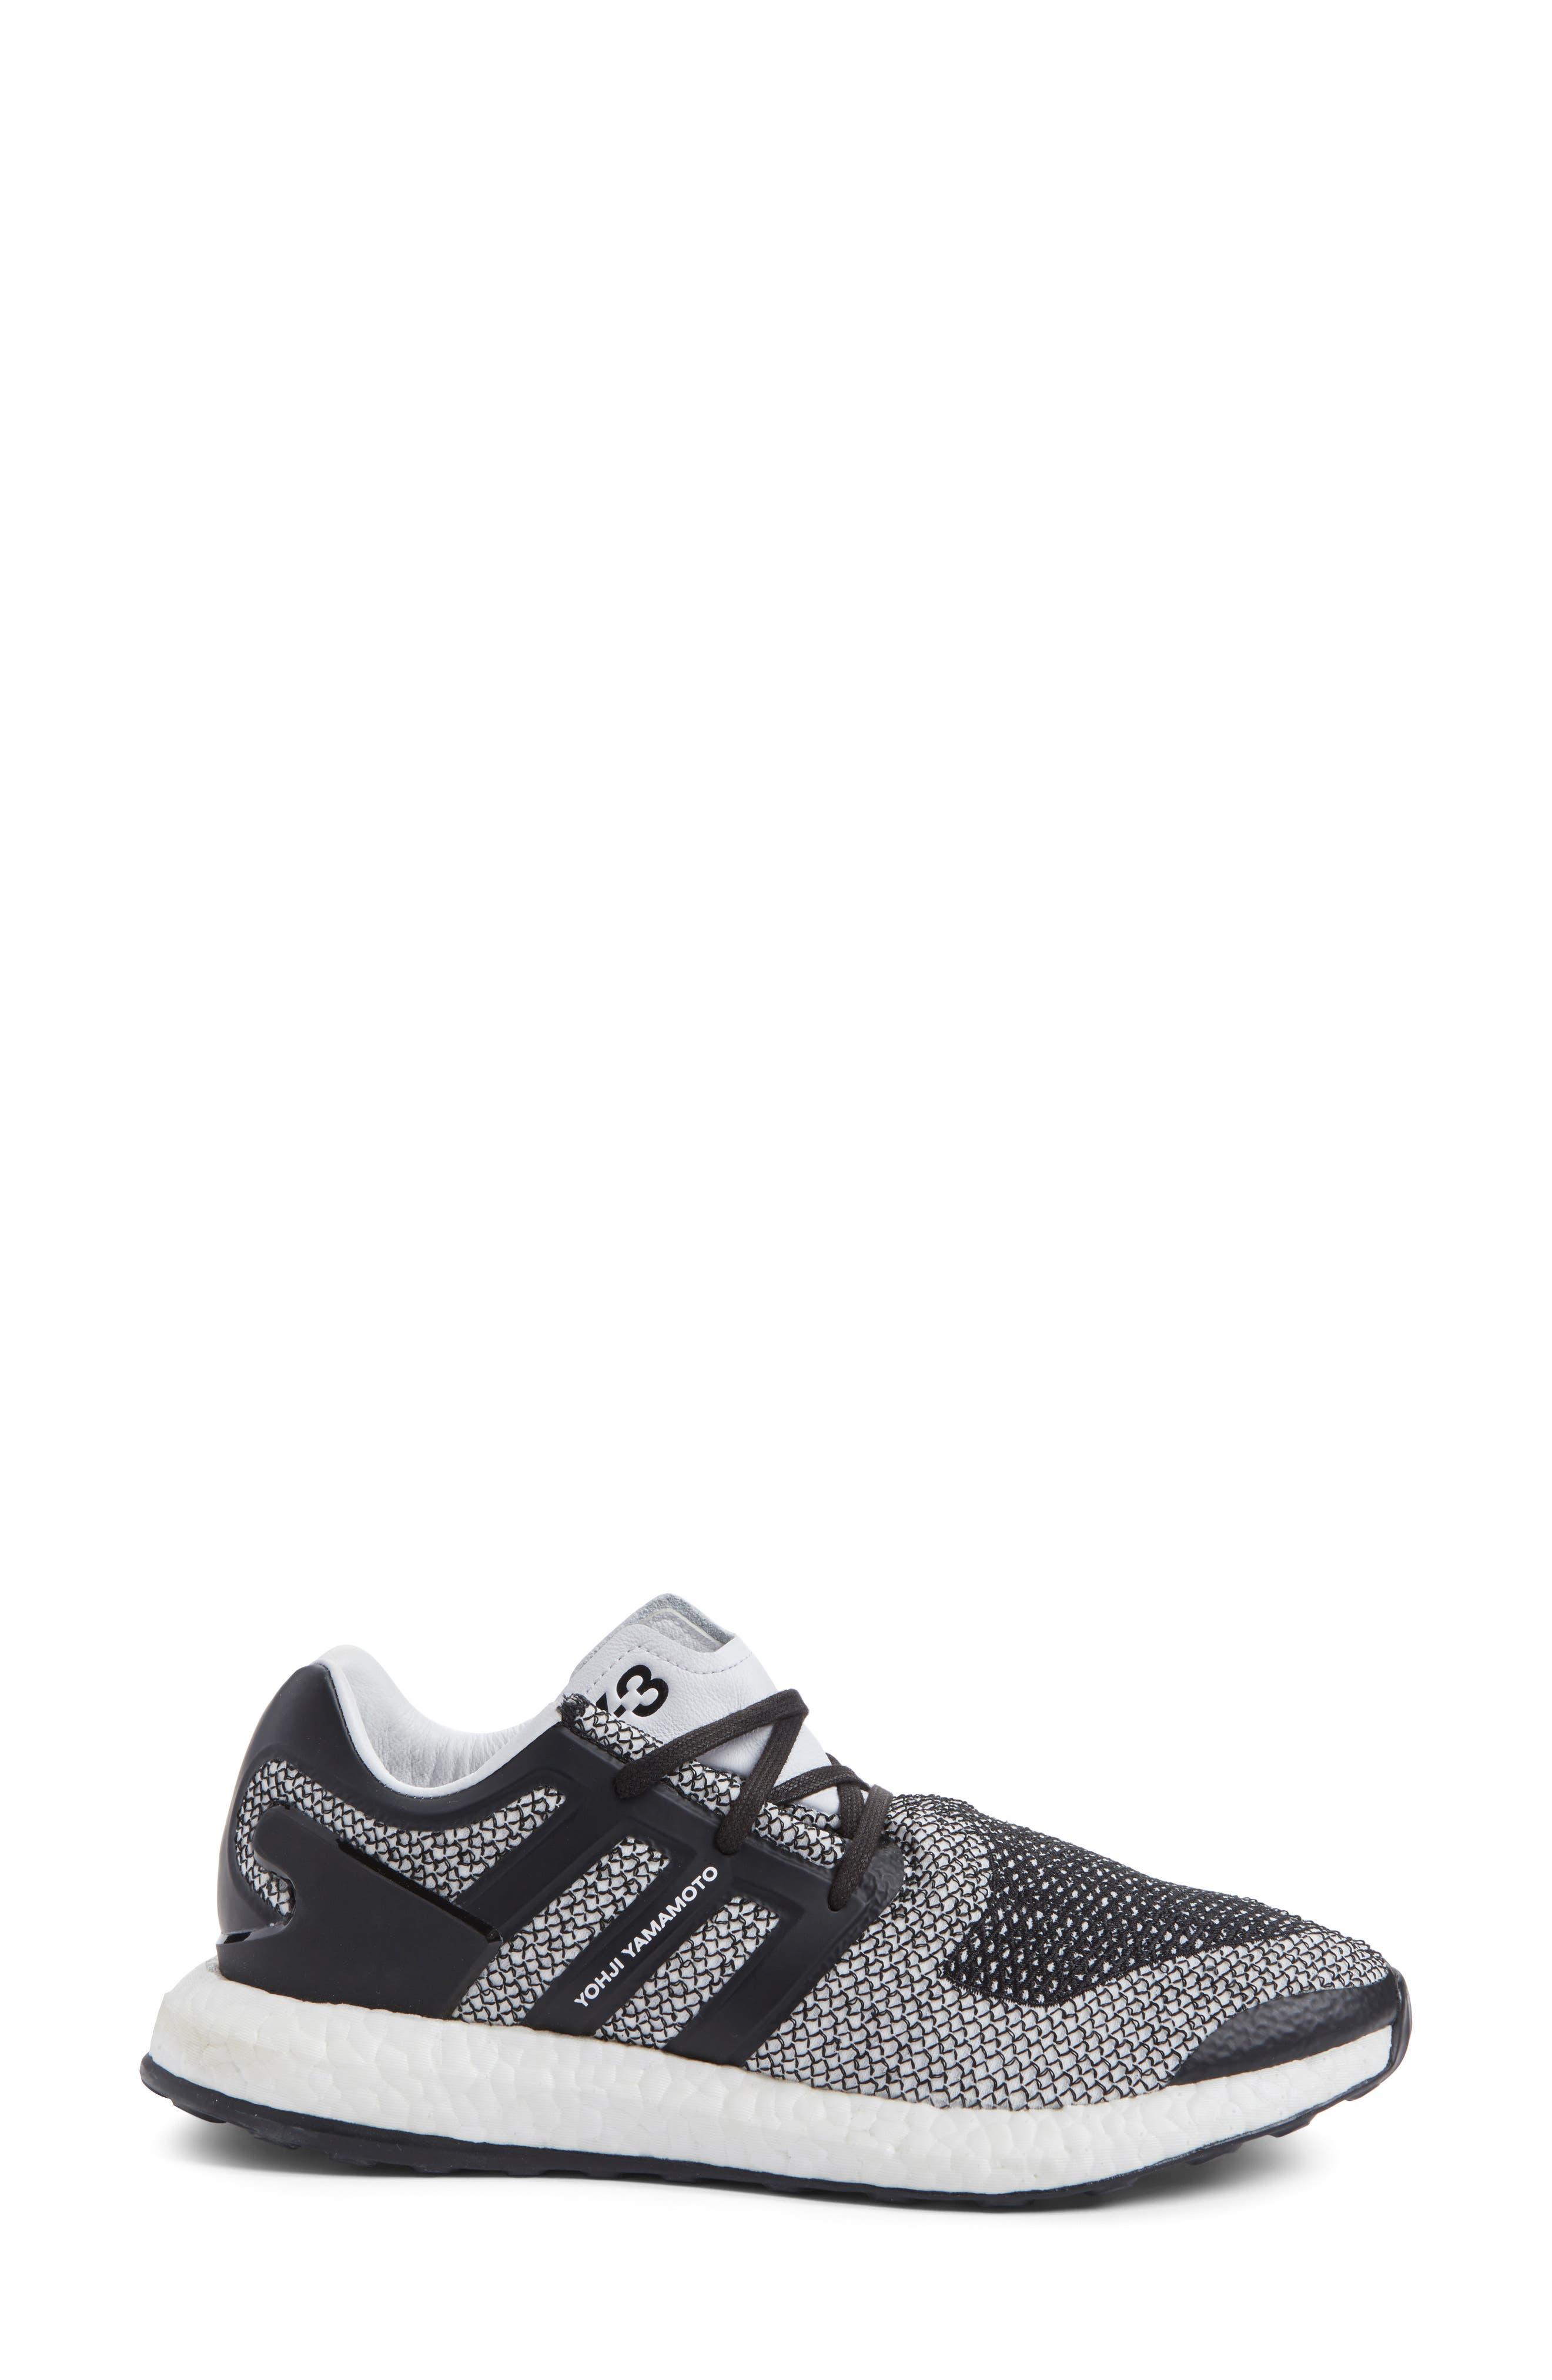 PureBoost Sneaker,                             Alternate thumbnail 3, color,                             White/ Core Black